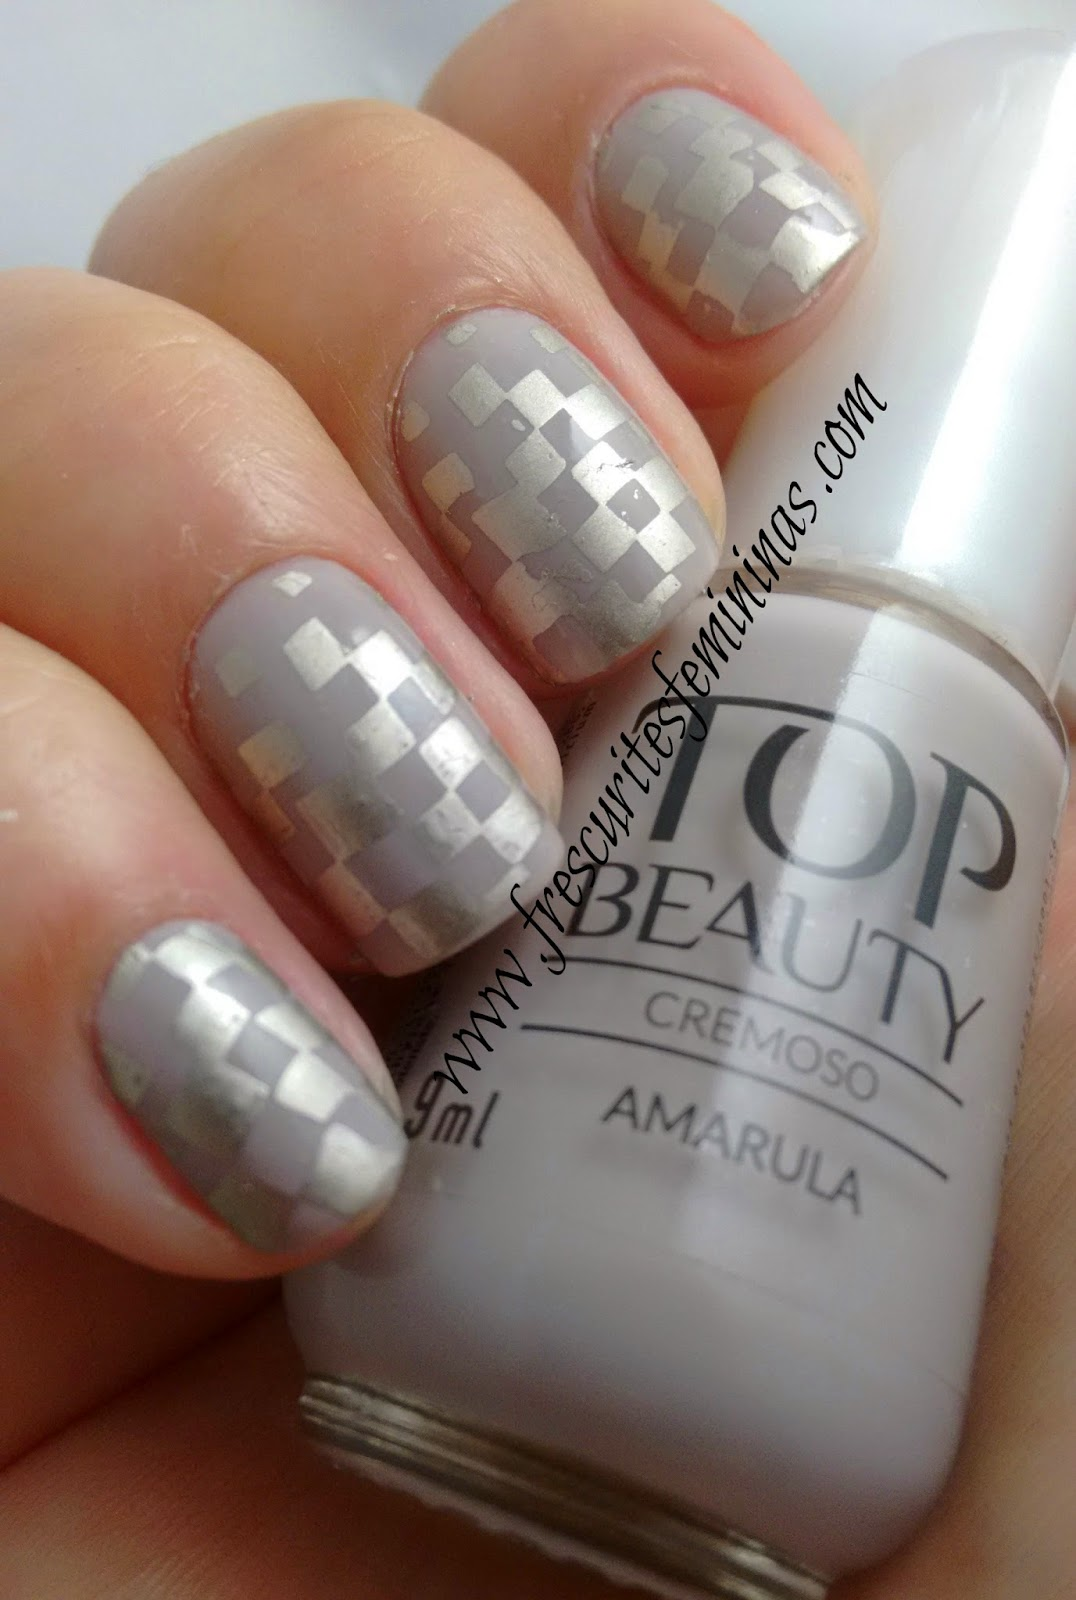 Amarula, Top Beauty, Frescurites Femininas, Carimbo, Nail Stamp